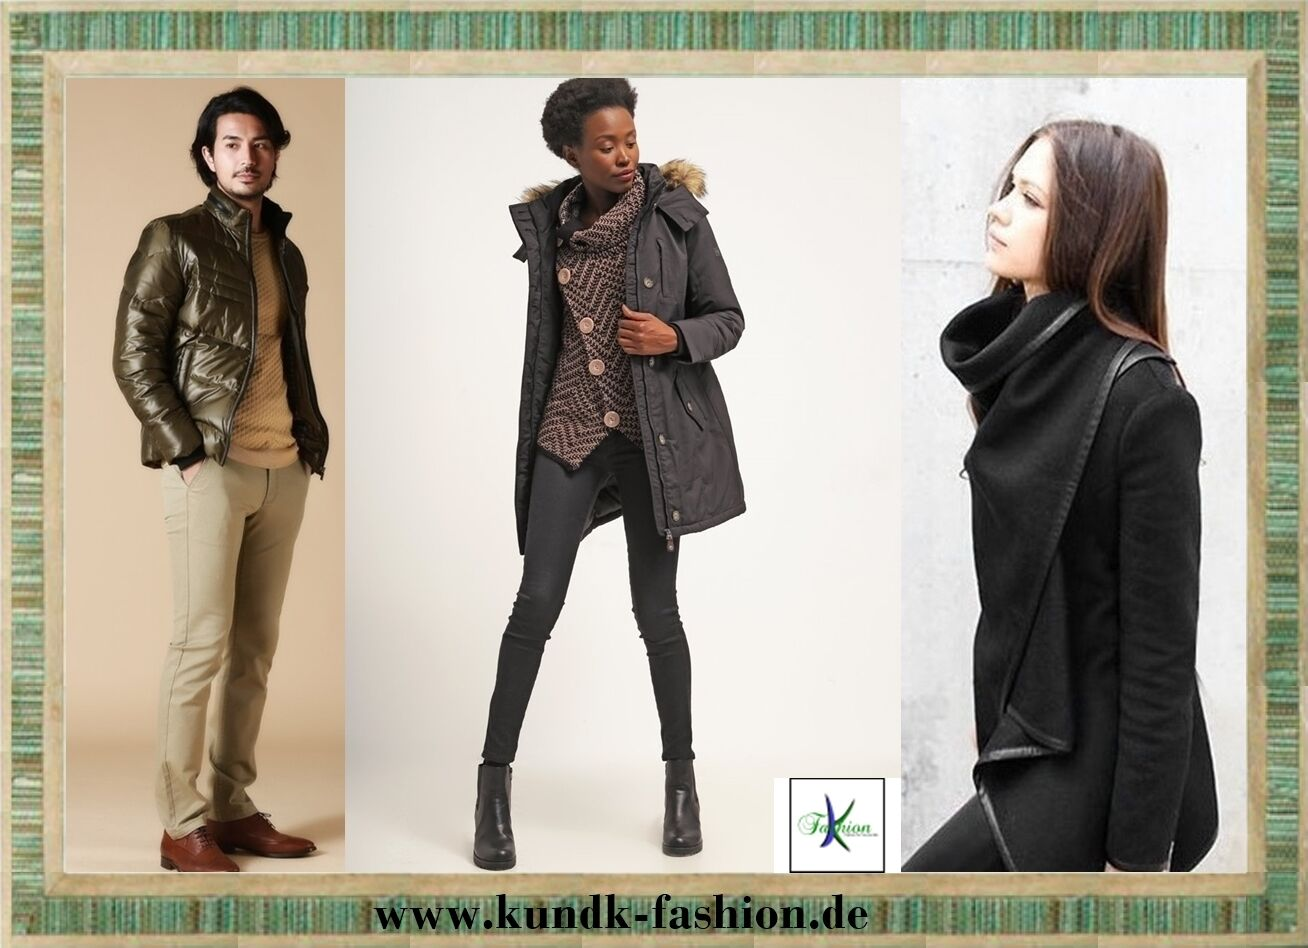 K & K Fashion